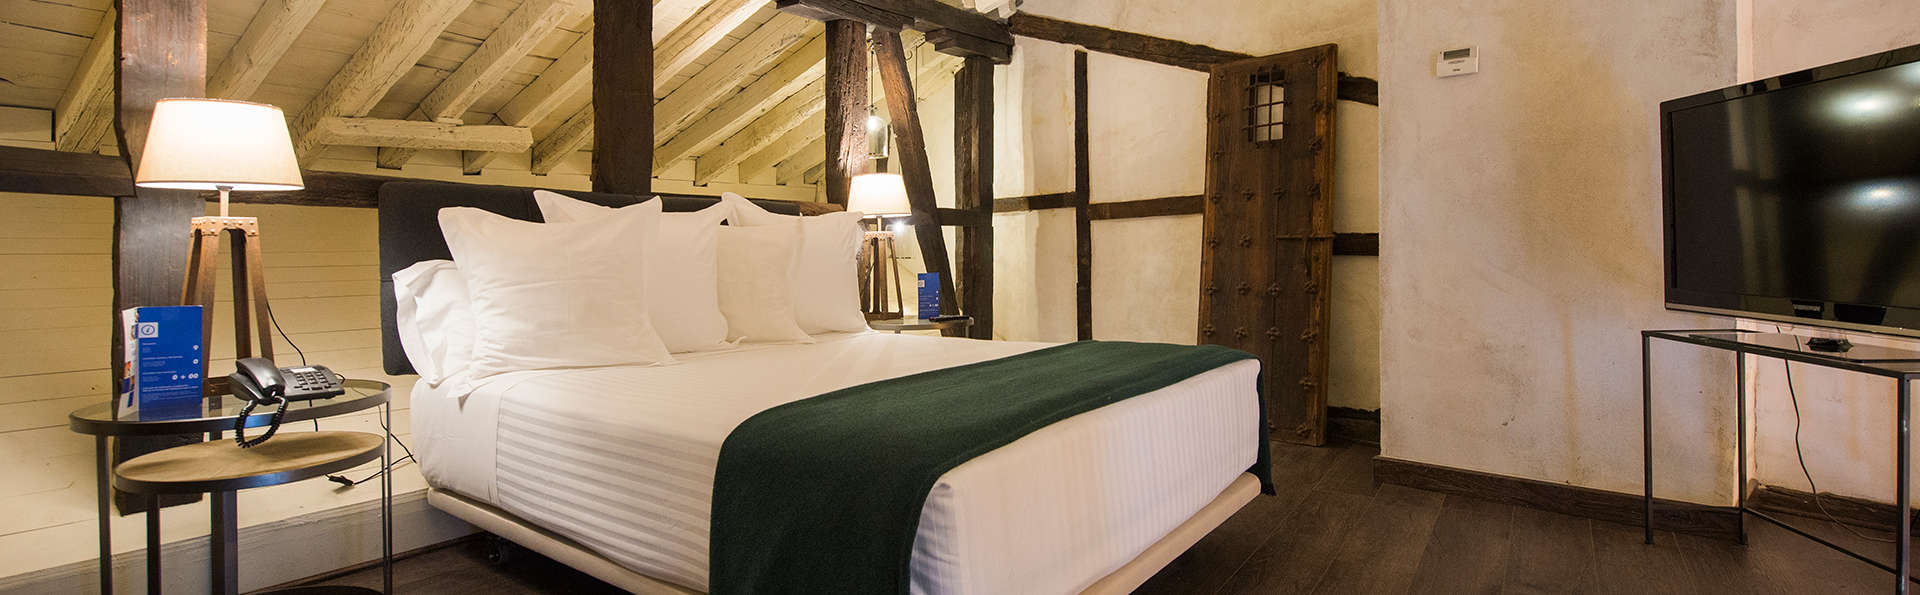 Hotel Abad Toledo - Edit_Room14.jpg